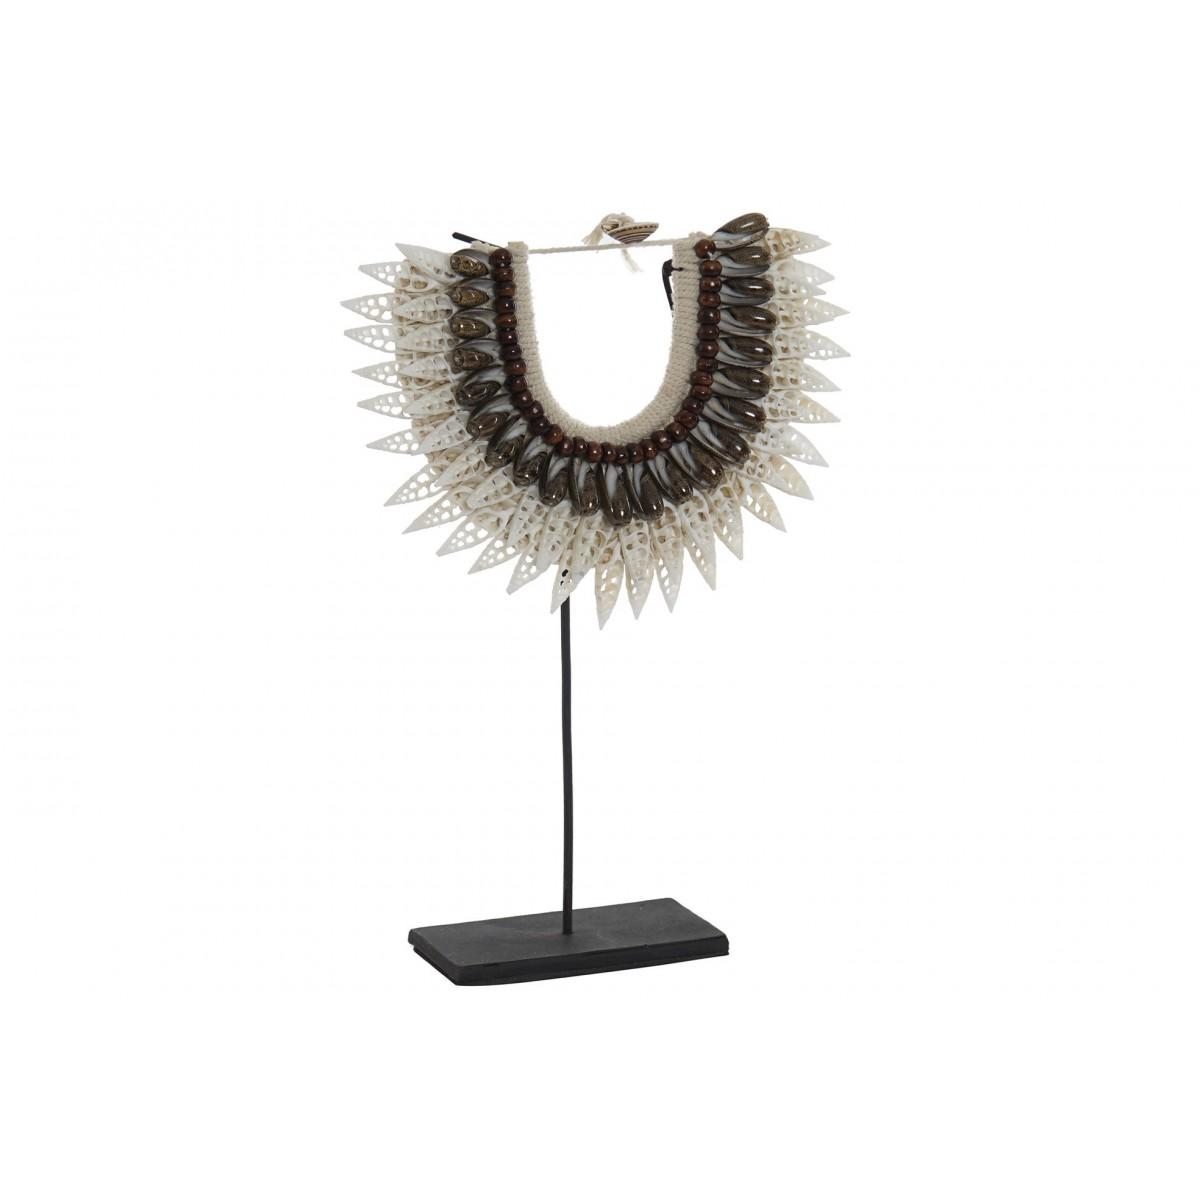 Sculpture Collier de Coquillages